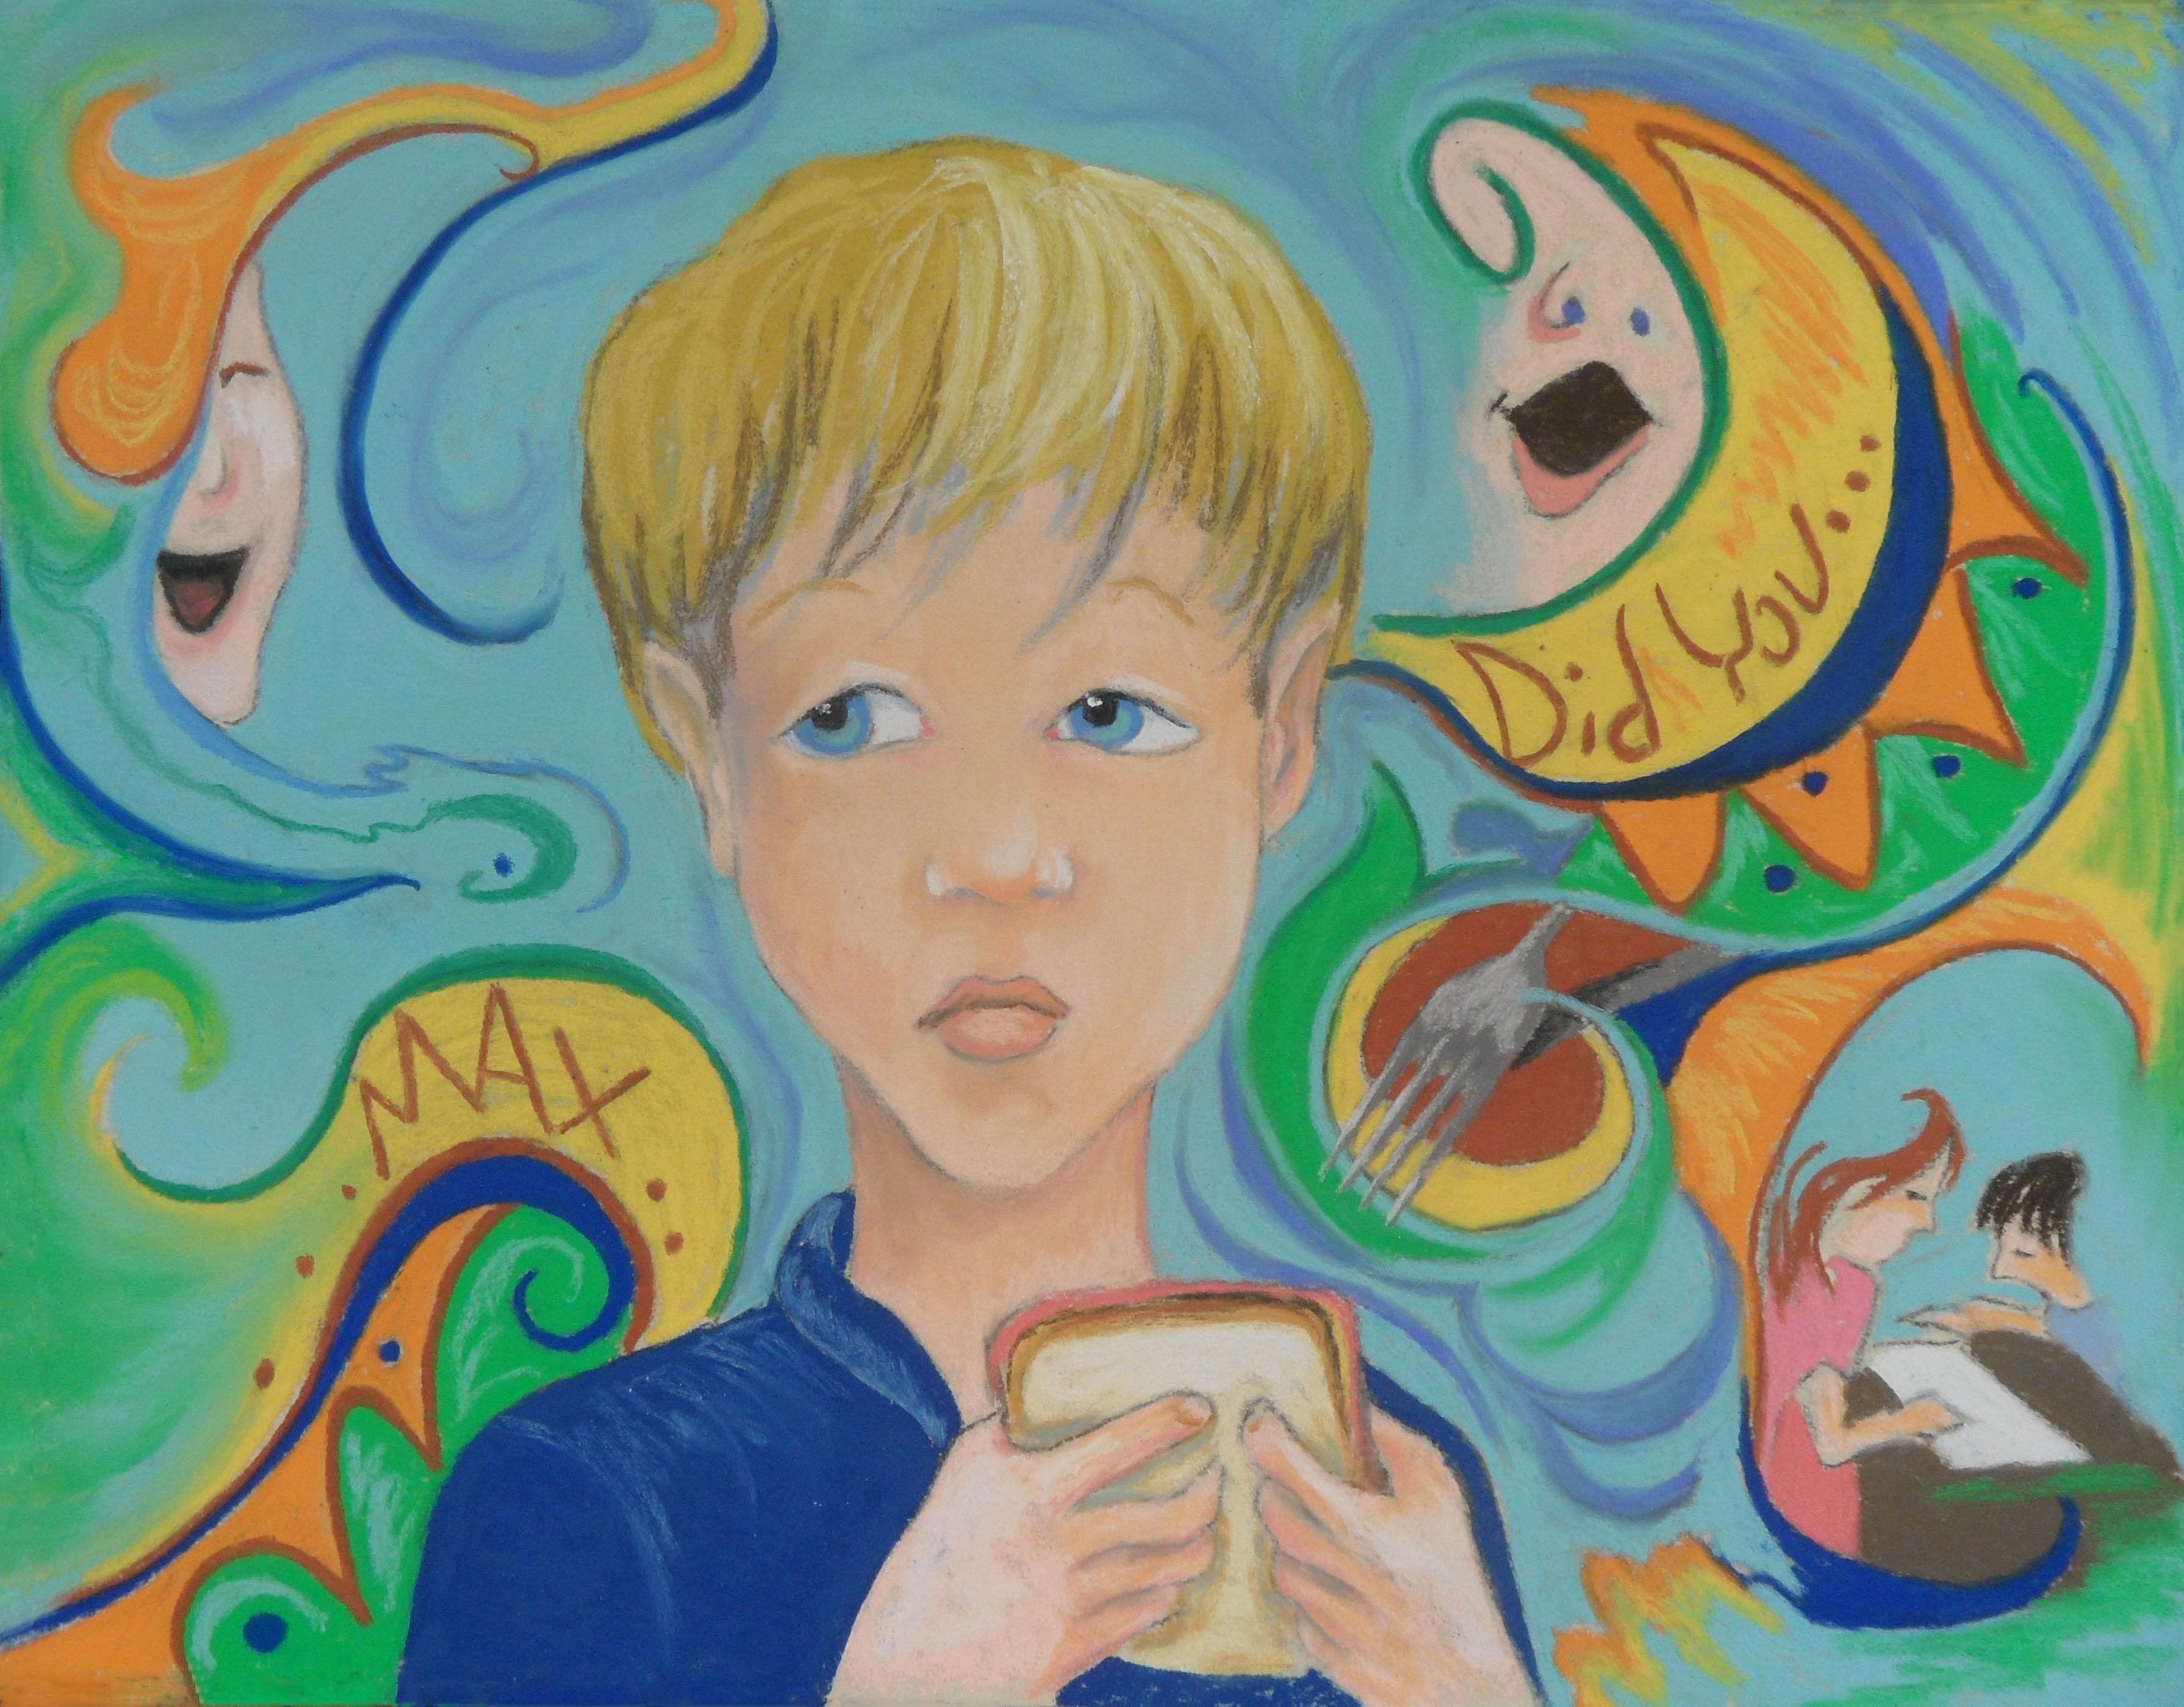 2-6-14 kids and art portfolio 038.jpg